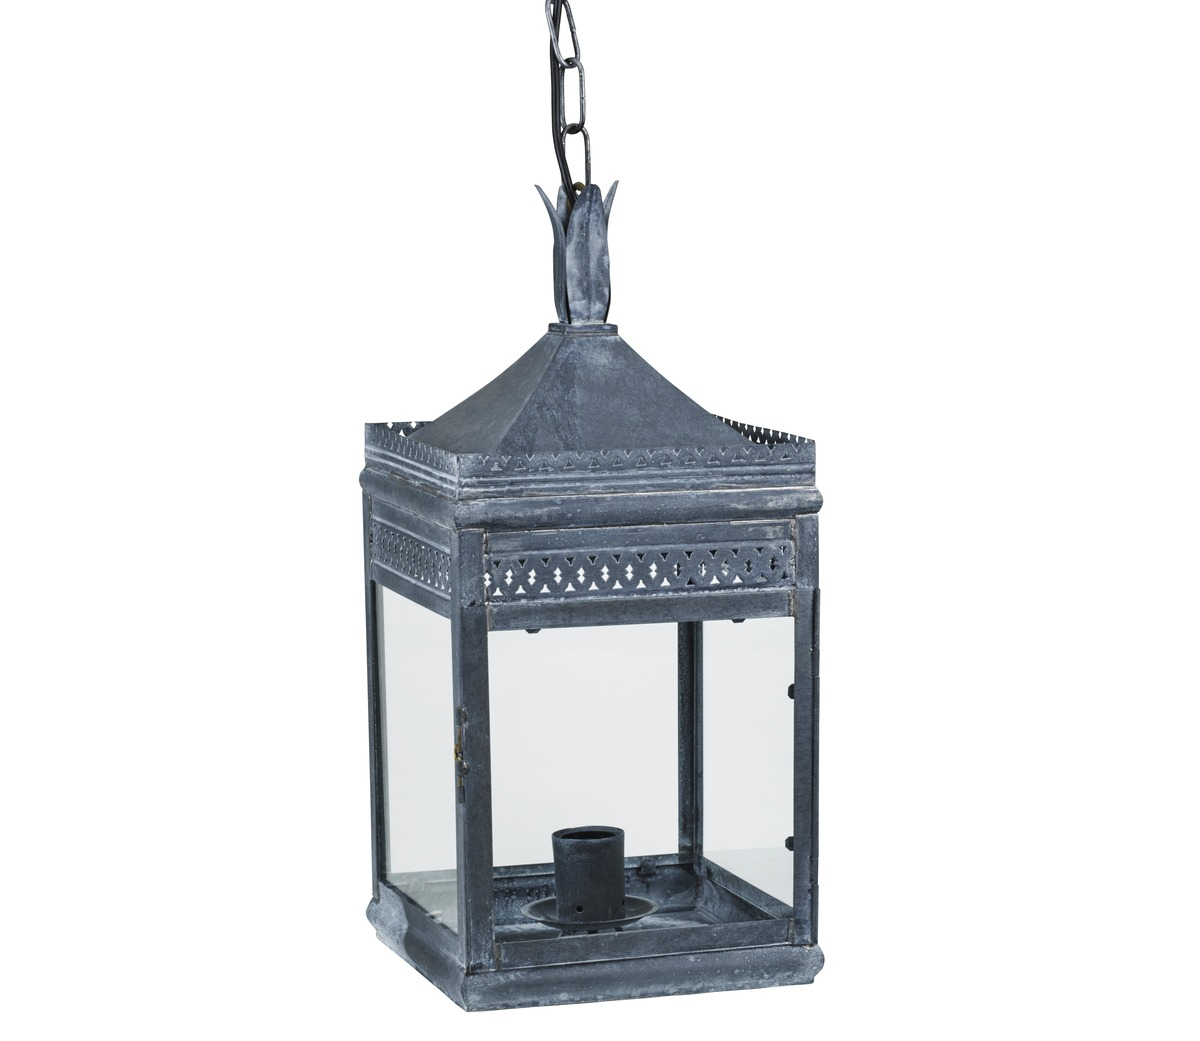 Lighting Pendant Antibes Hanging Lantern The French House